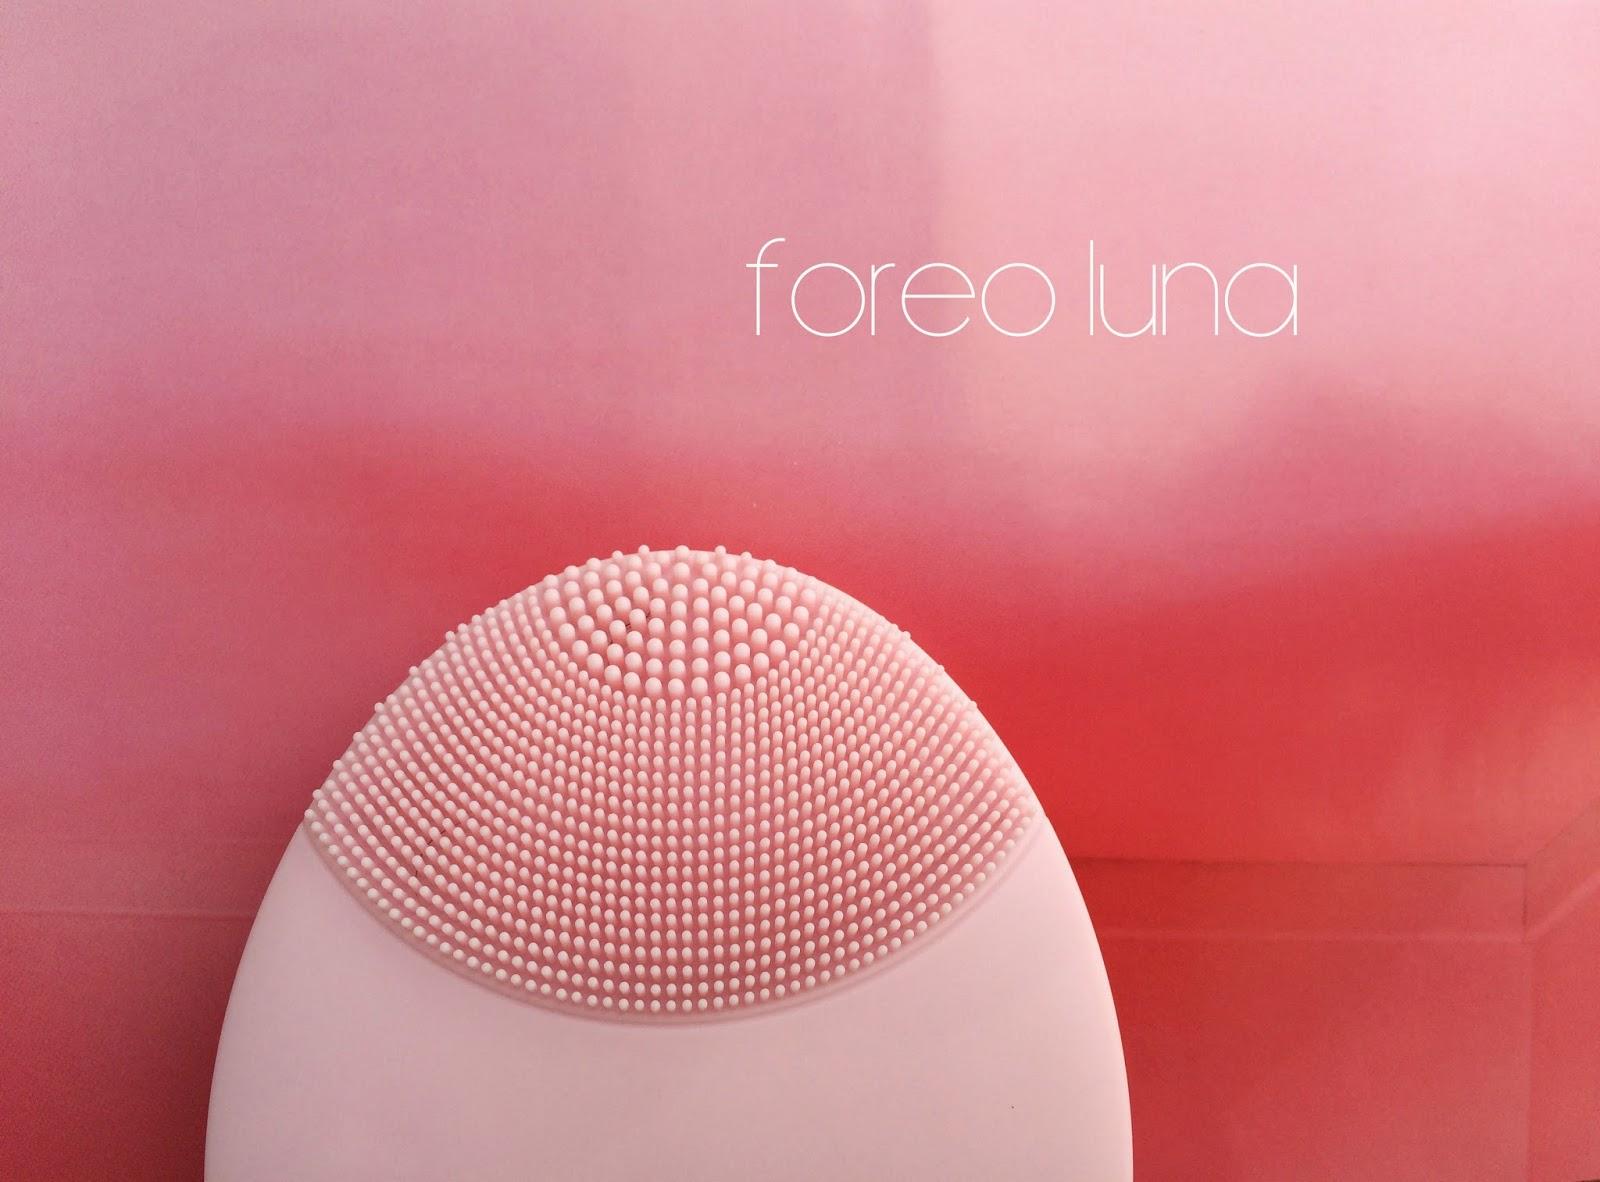 forea_luna